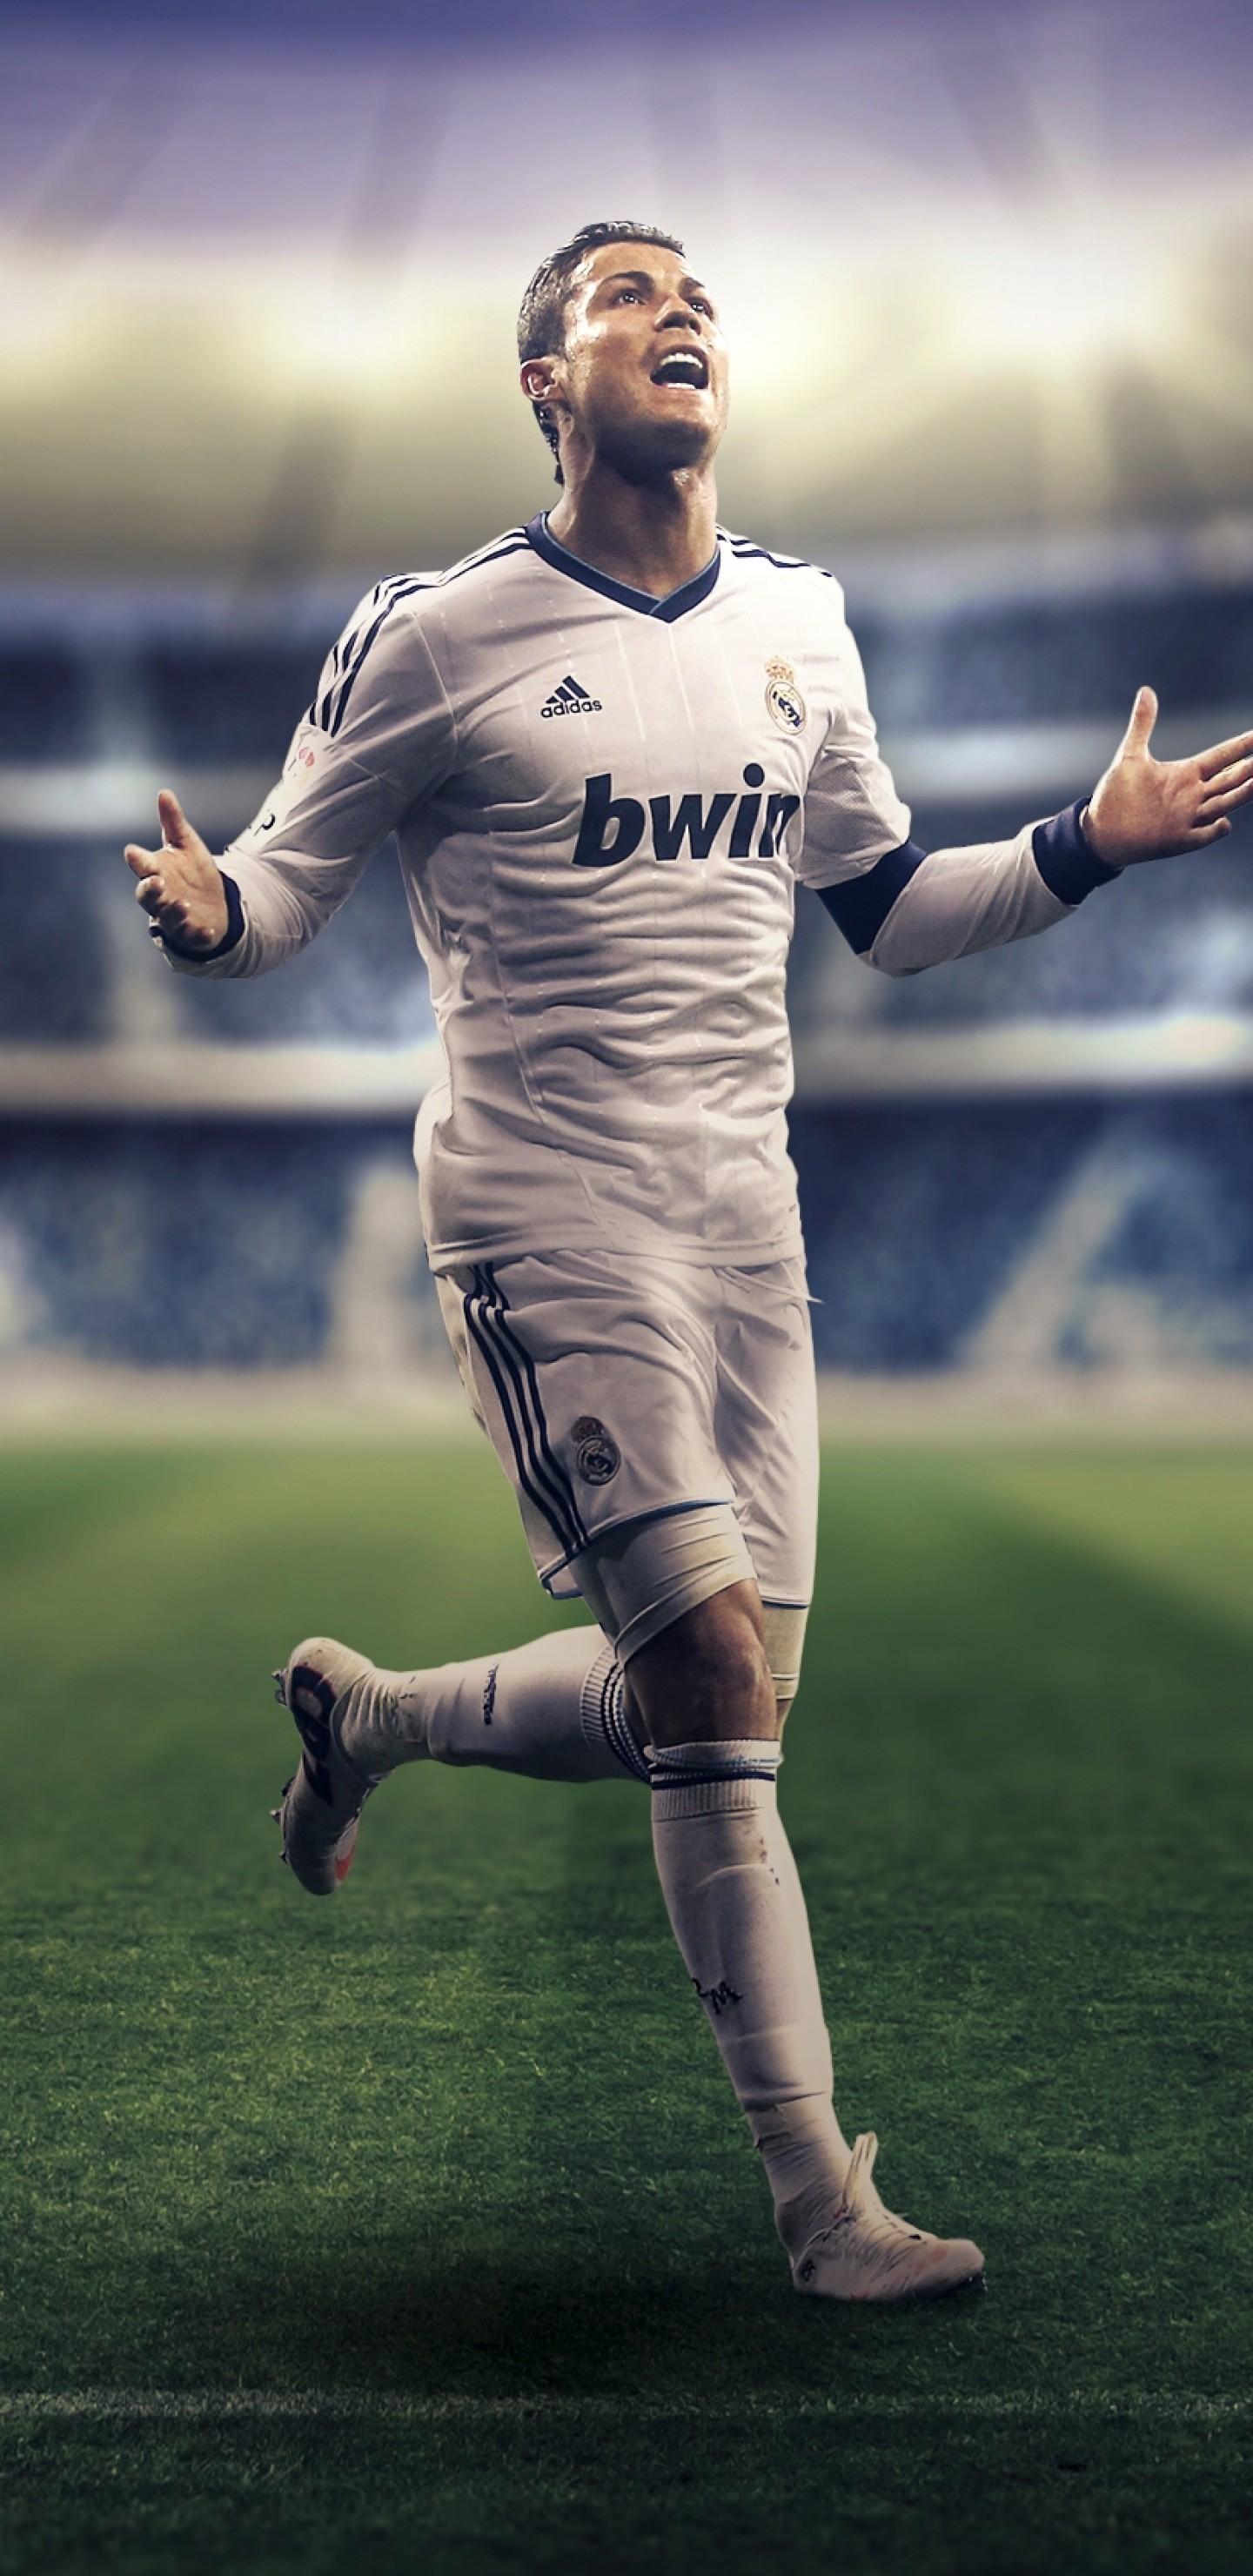 Res: 1440x2960, Cristiano Ronaldo, Football, Stadium